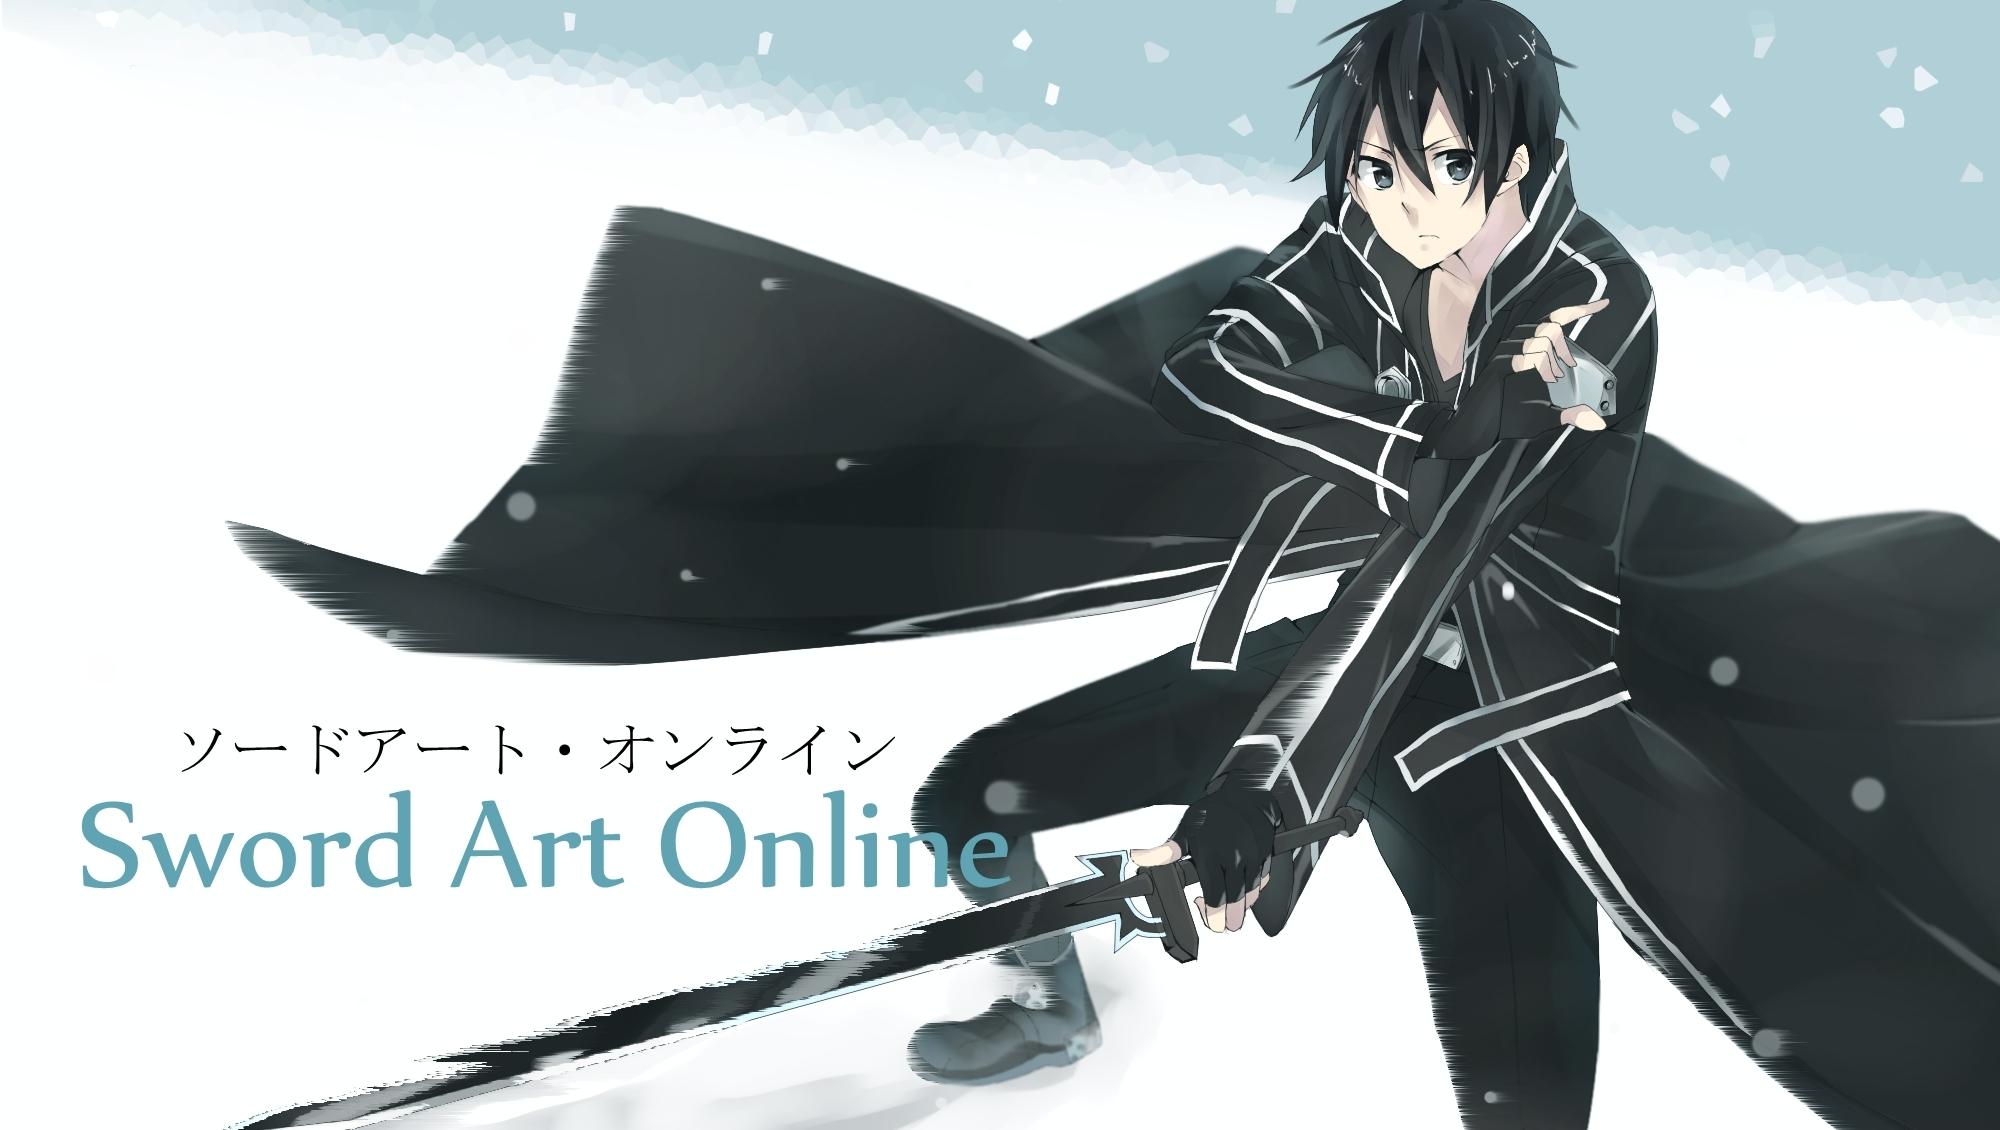 https://cosplayer.altervista.org/wp-content/uploads/2017/03/kirito-kirito-sword-art-online.jpg